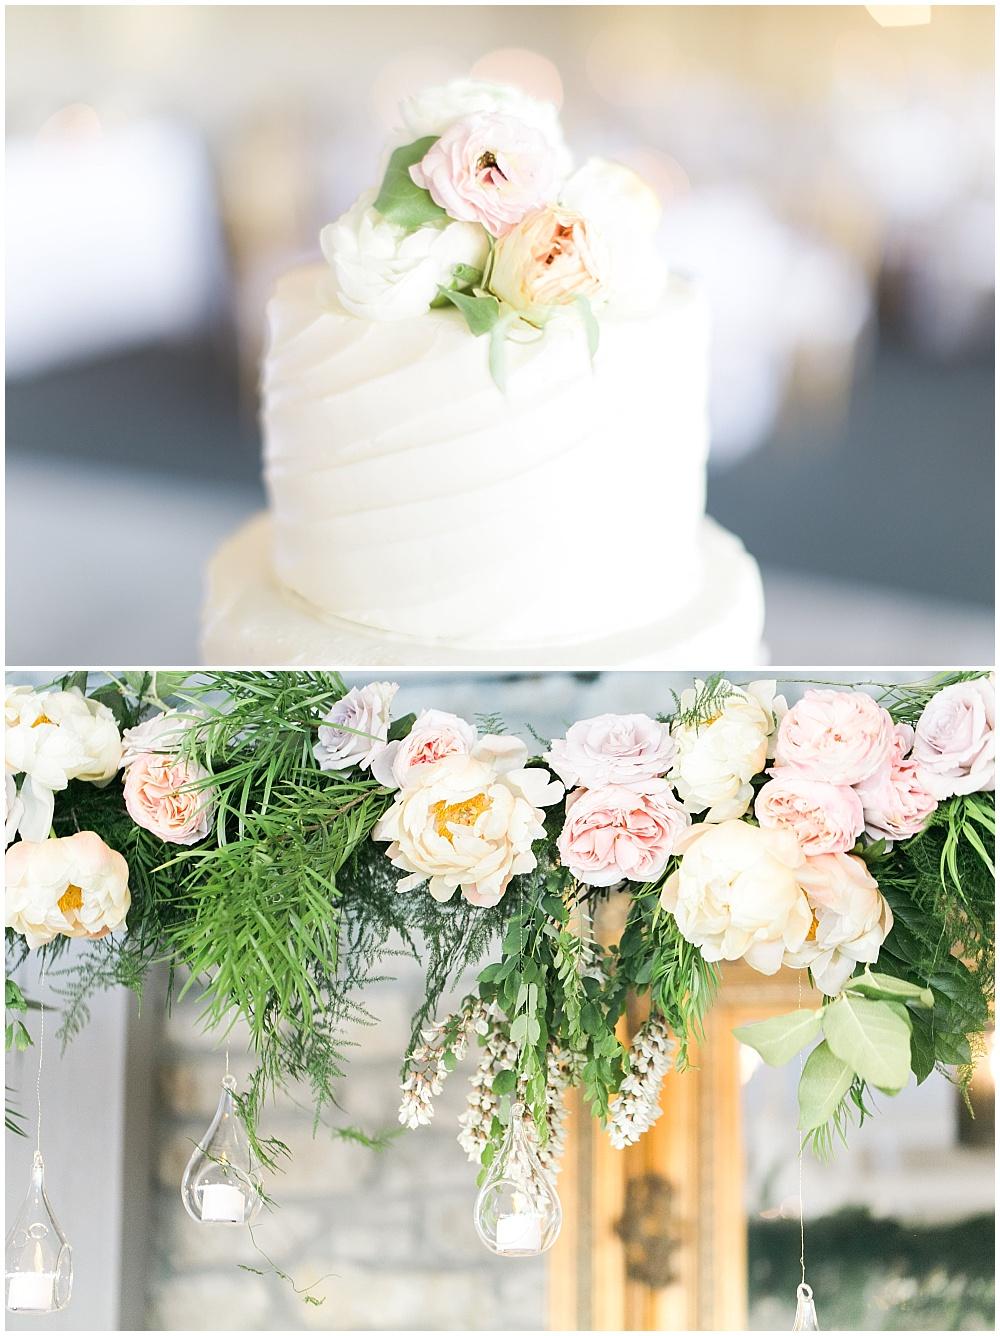 white wedding cake, suspended head table florals, subtle cake flowers, Spring floral + gold wedding | Ivan & Louise Images | Jessica Dum Wedding Coordination